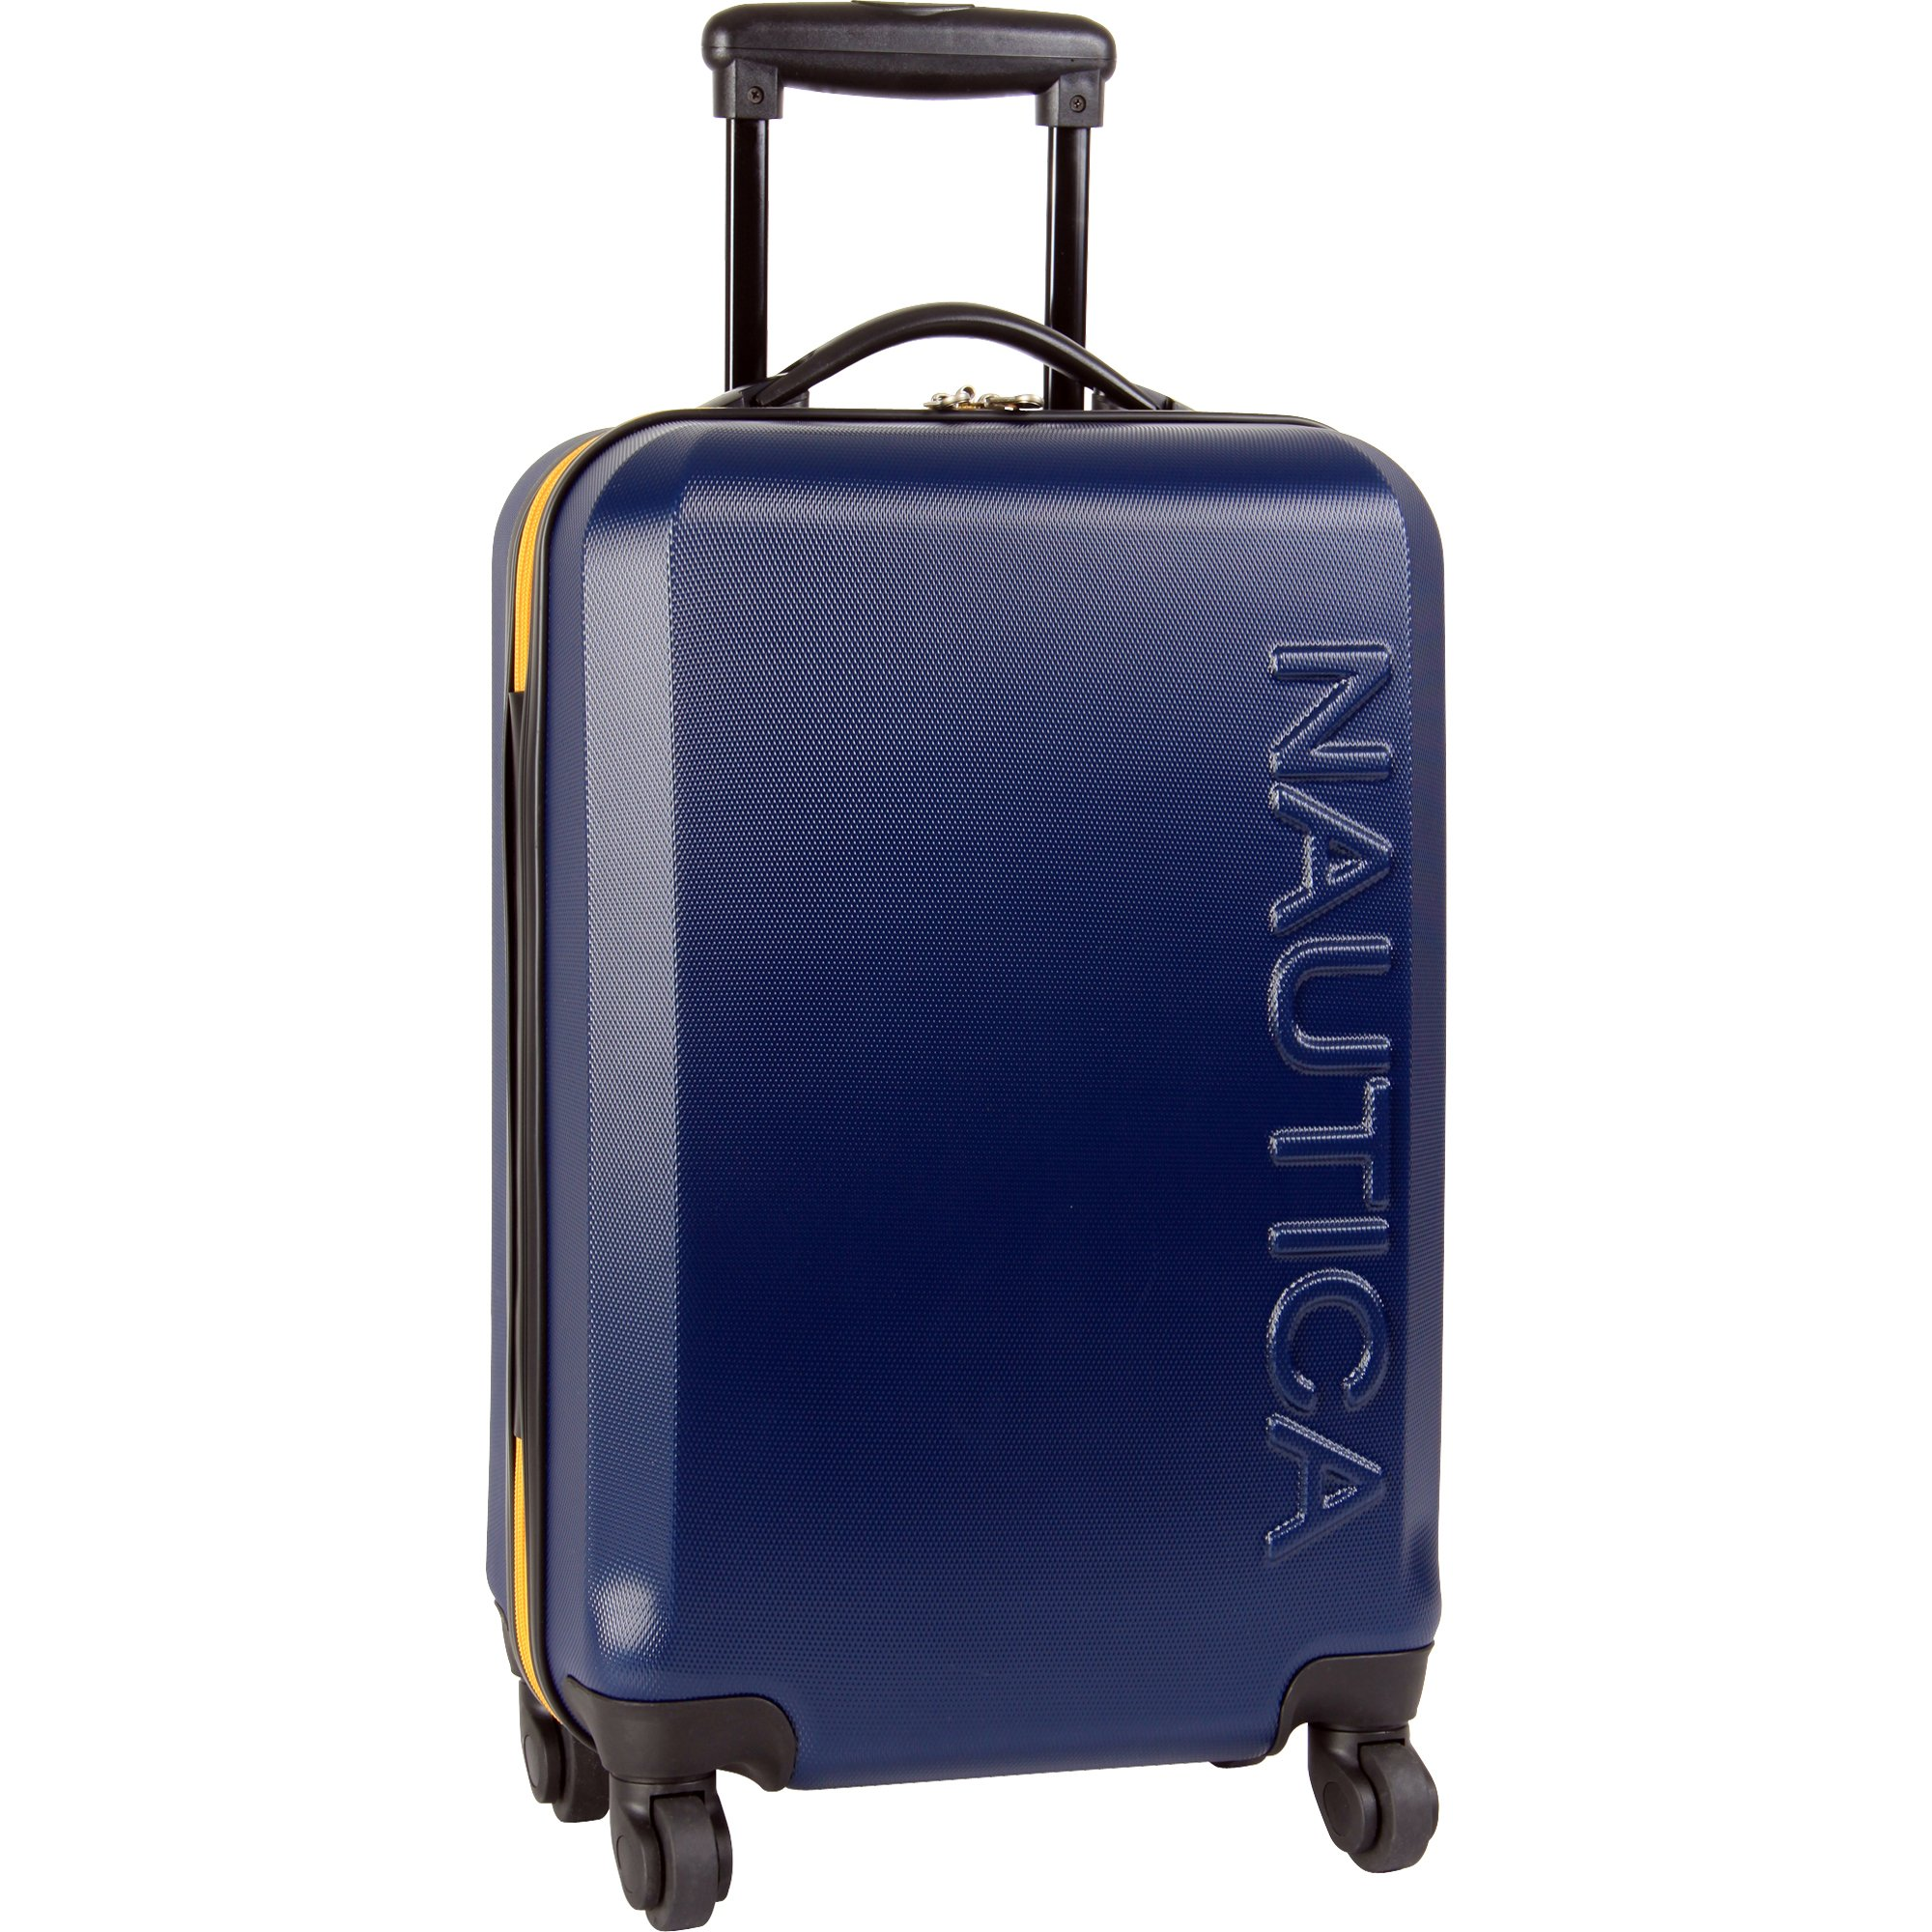 Nautica 24'' Hardside Expandable Spinner Luggage, Navy/Yellow